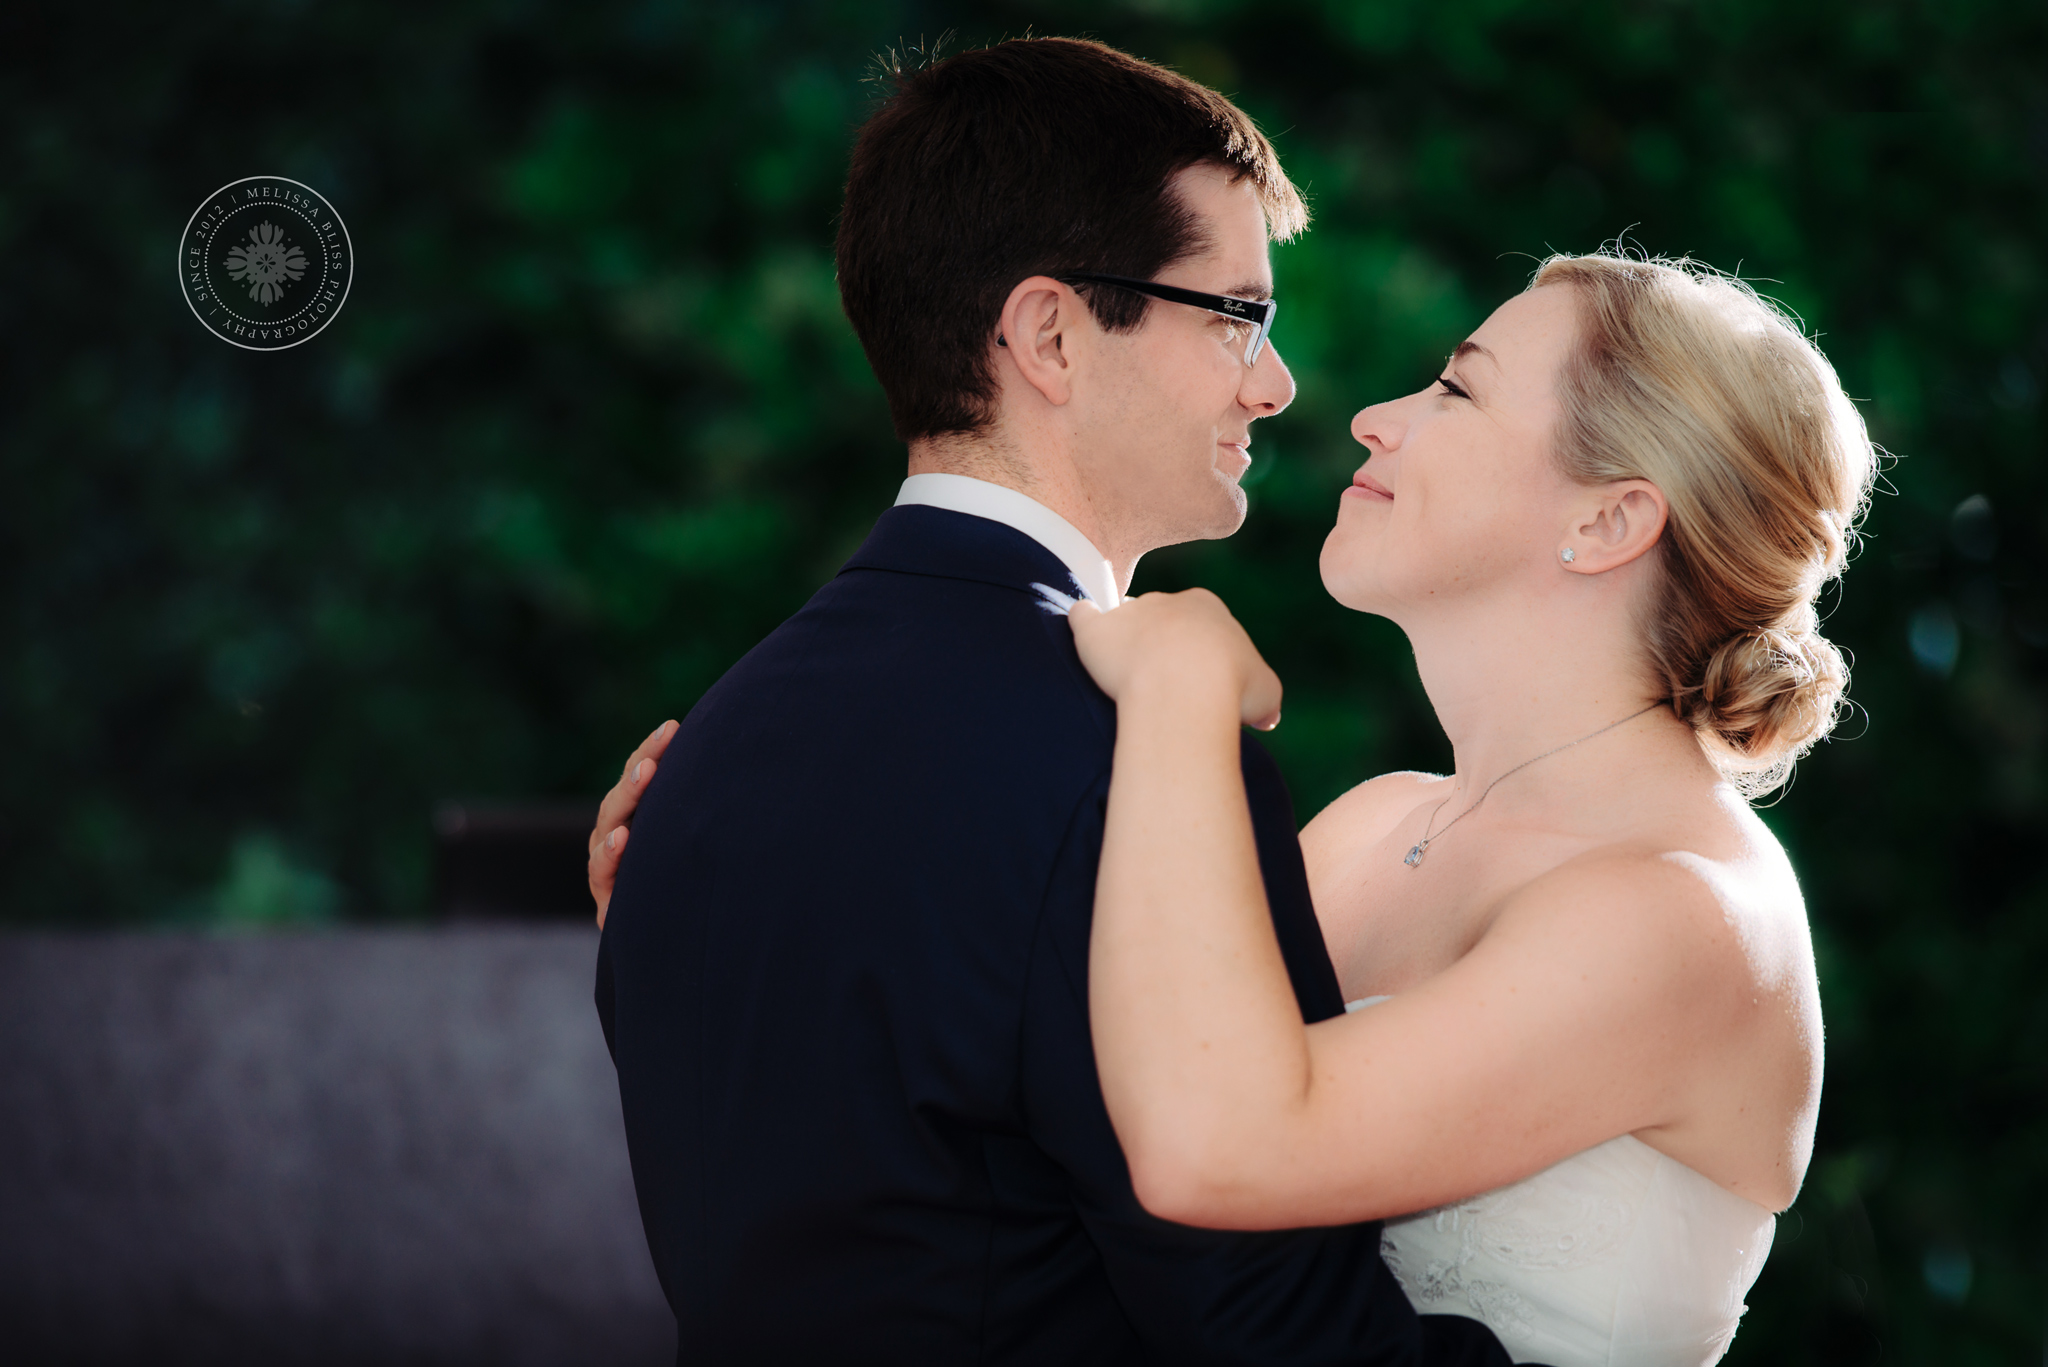 hampton-roads-wedding-photographer-melissa-bliss-photography-church-point-manor-wedding-venue-virginia-beach-first-dance-real-weddings